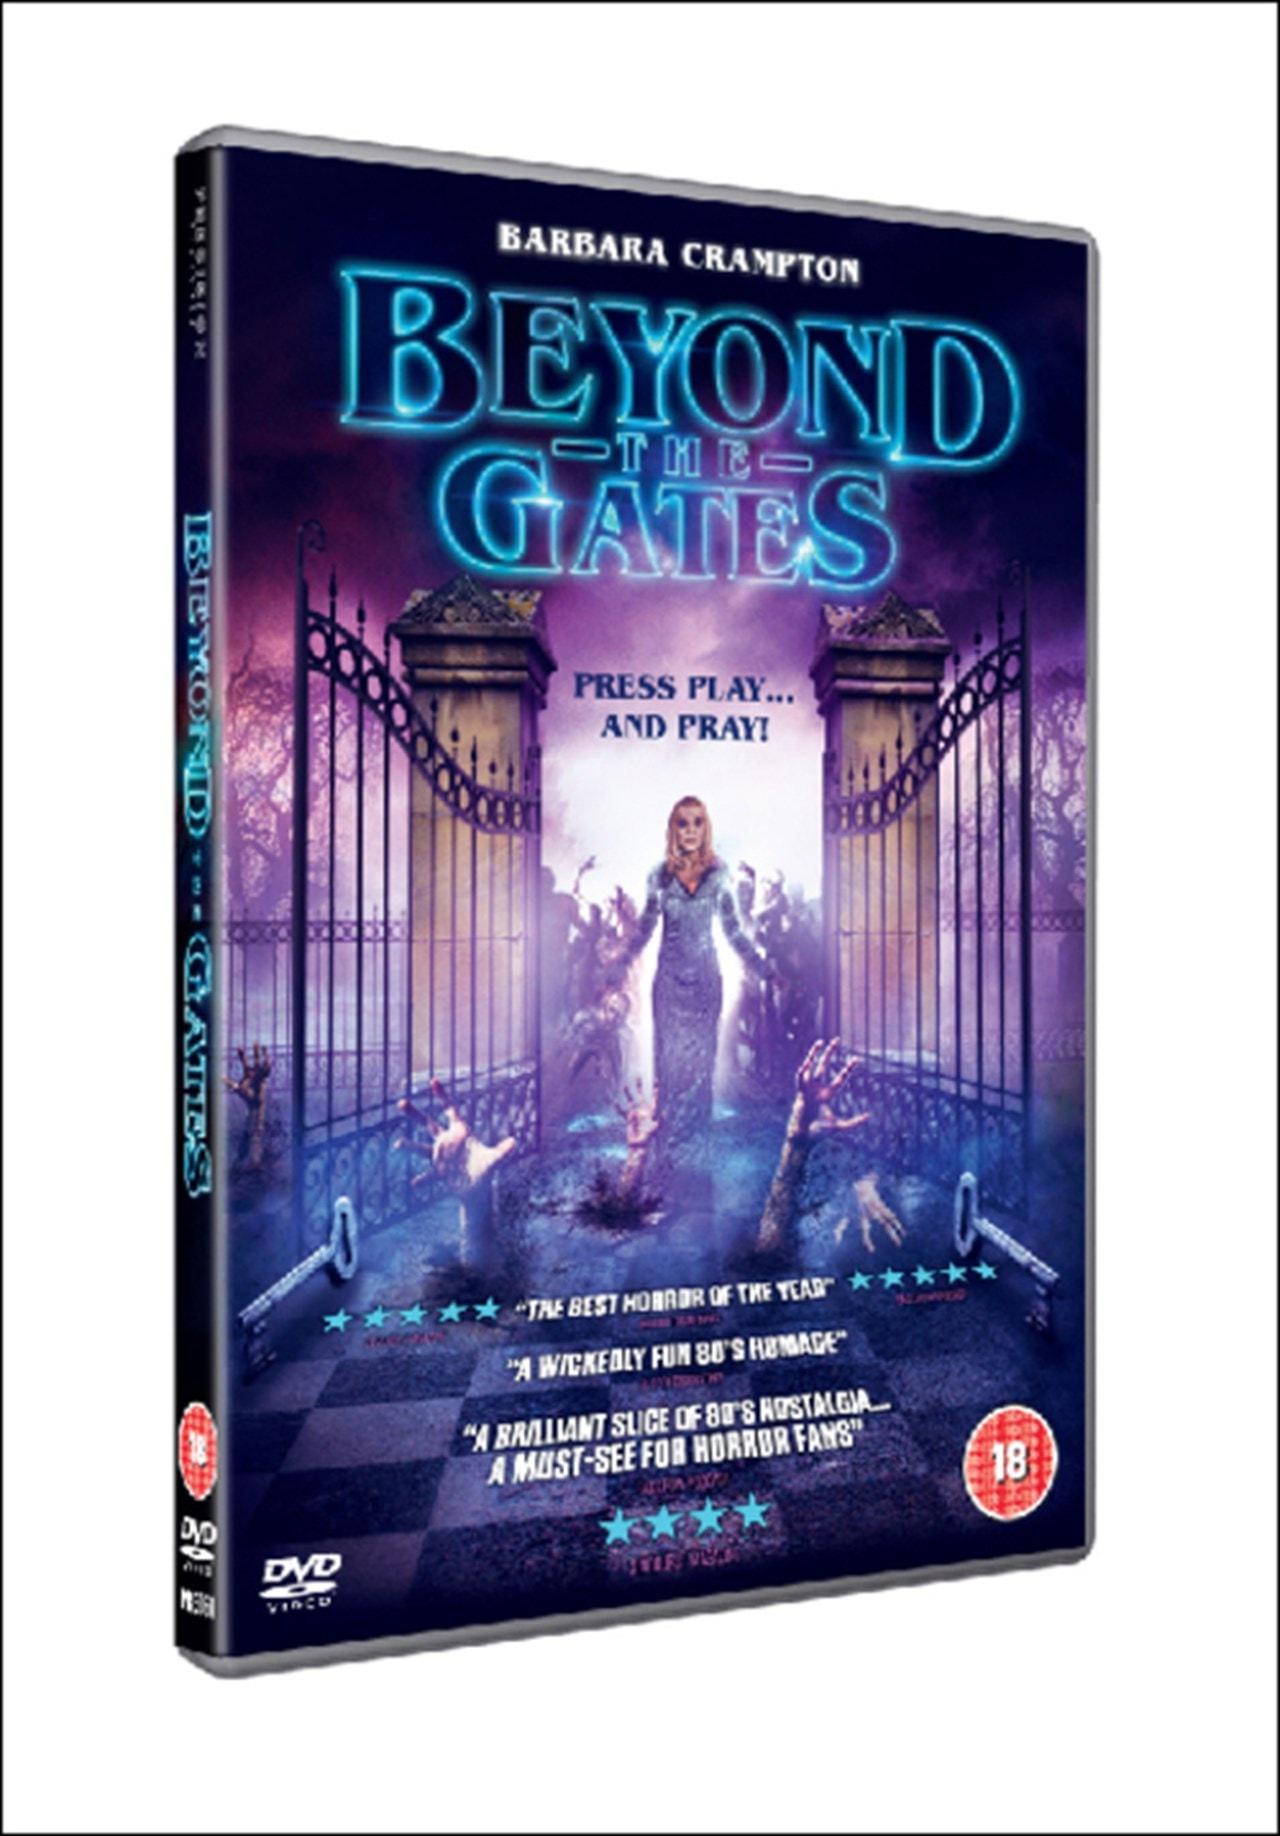 Beyond the Gates - 2